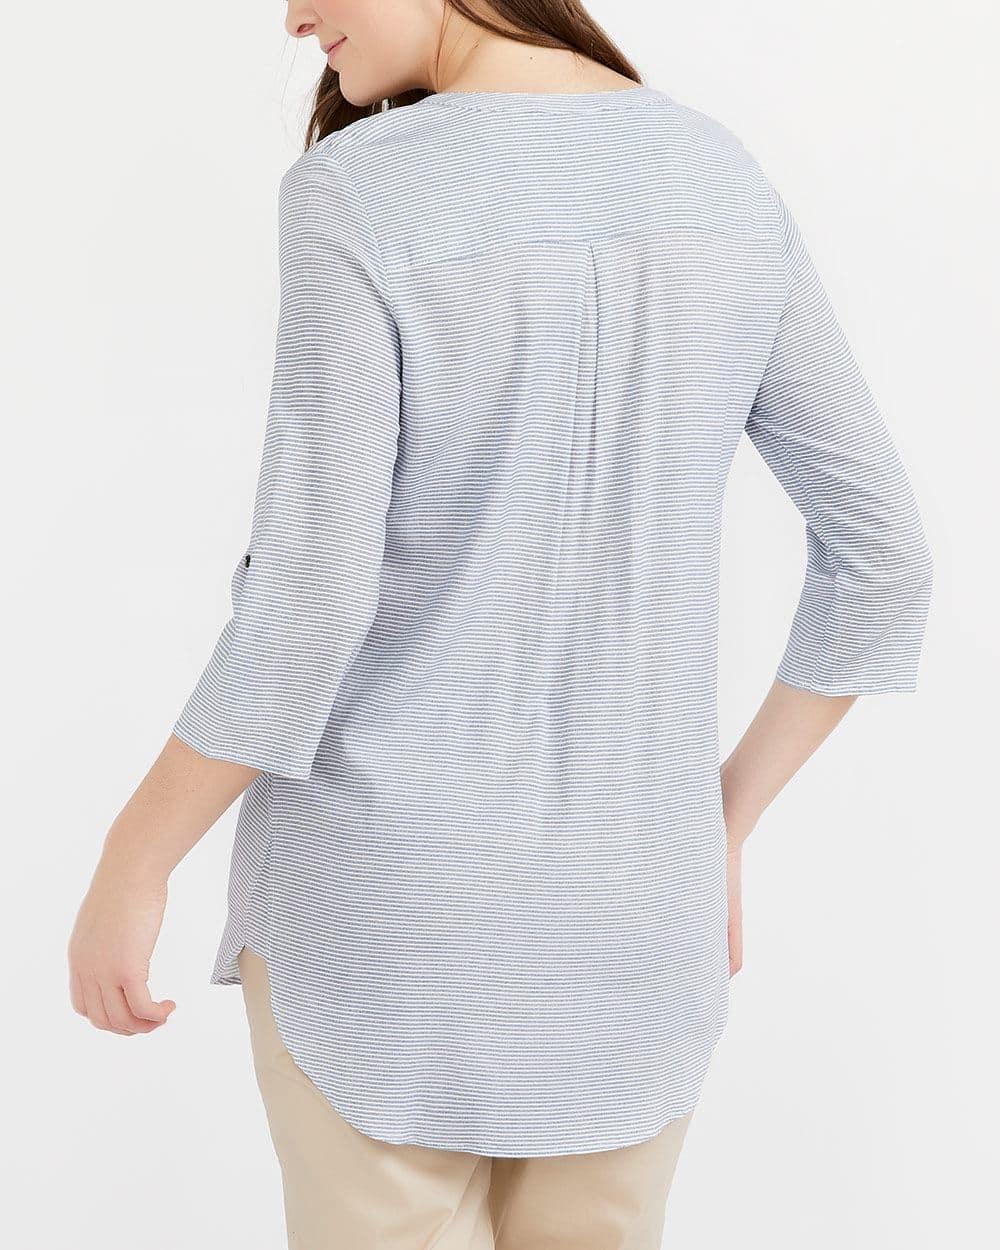 Shirred Detail Printed Tunic Shirt